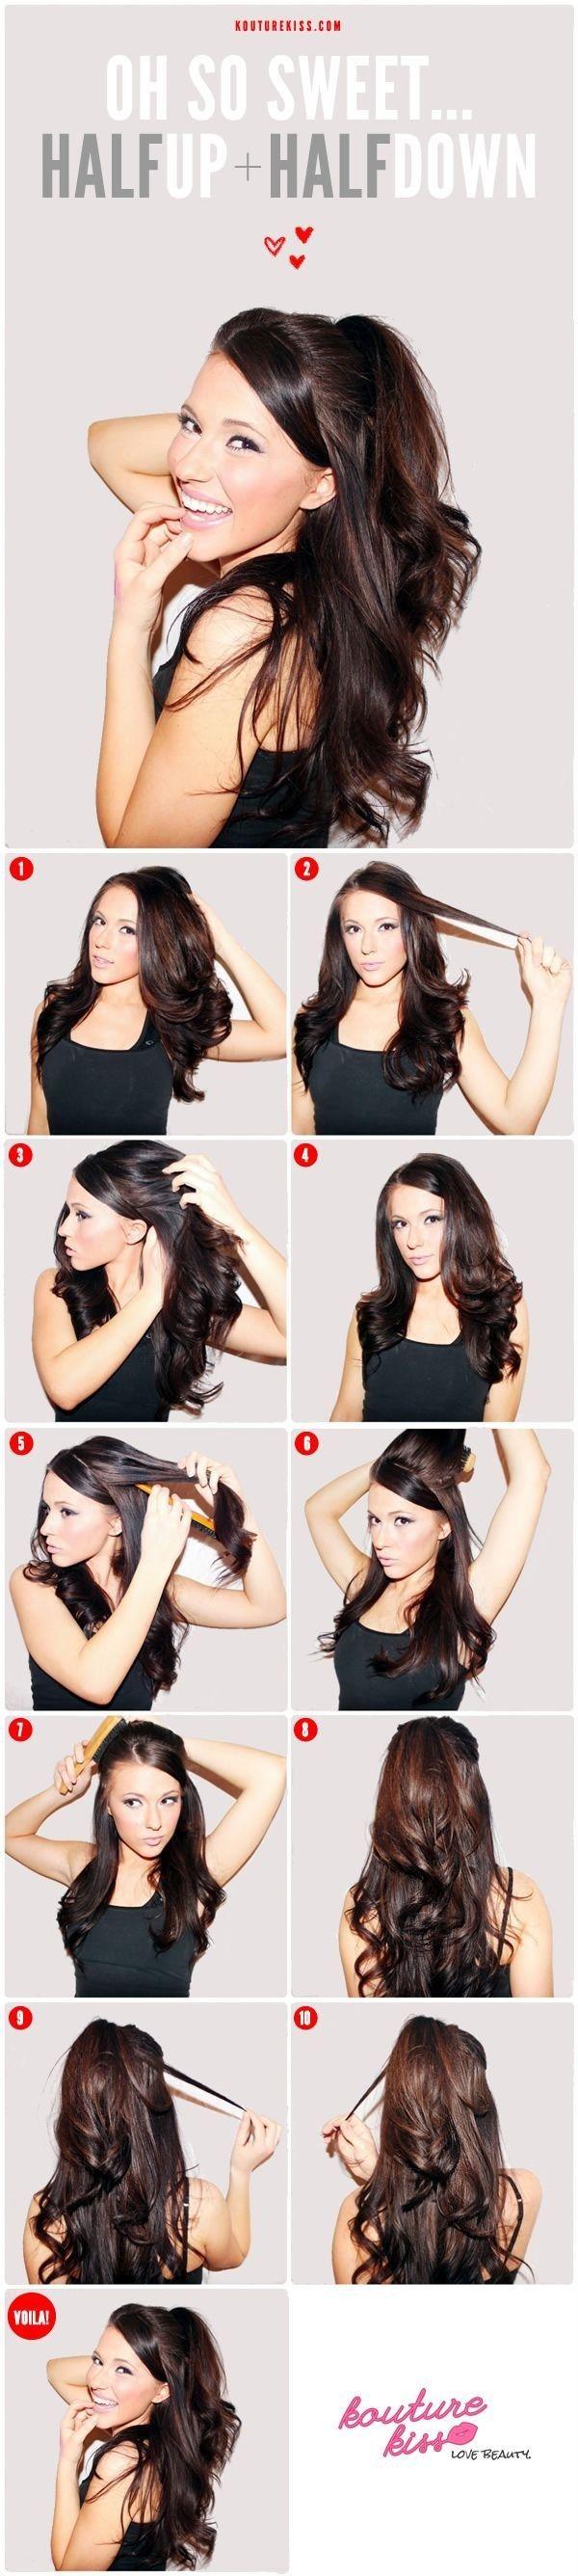 15-beautiful-half-up-half-down-wedding-hairstyles12